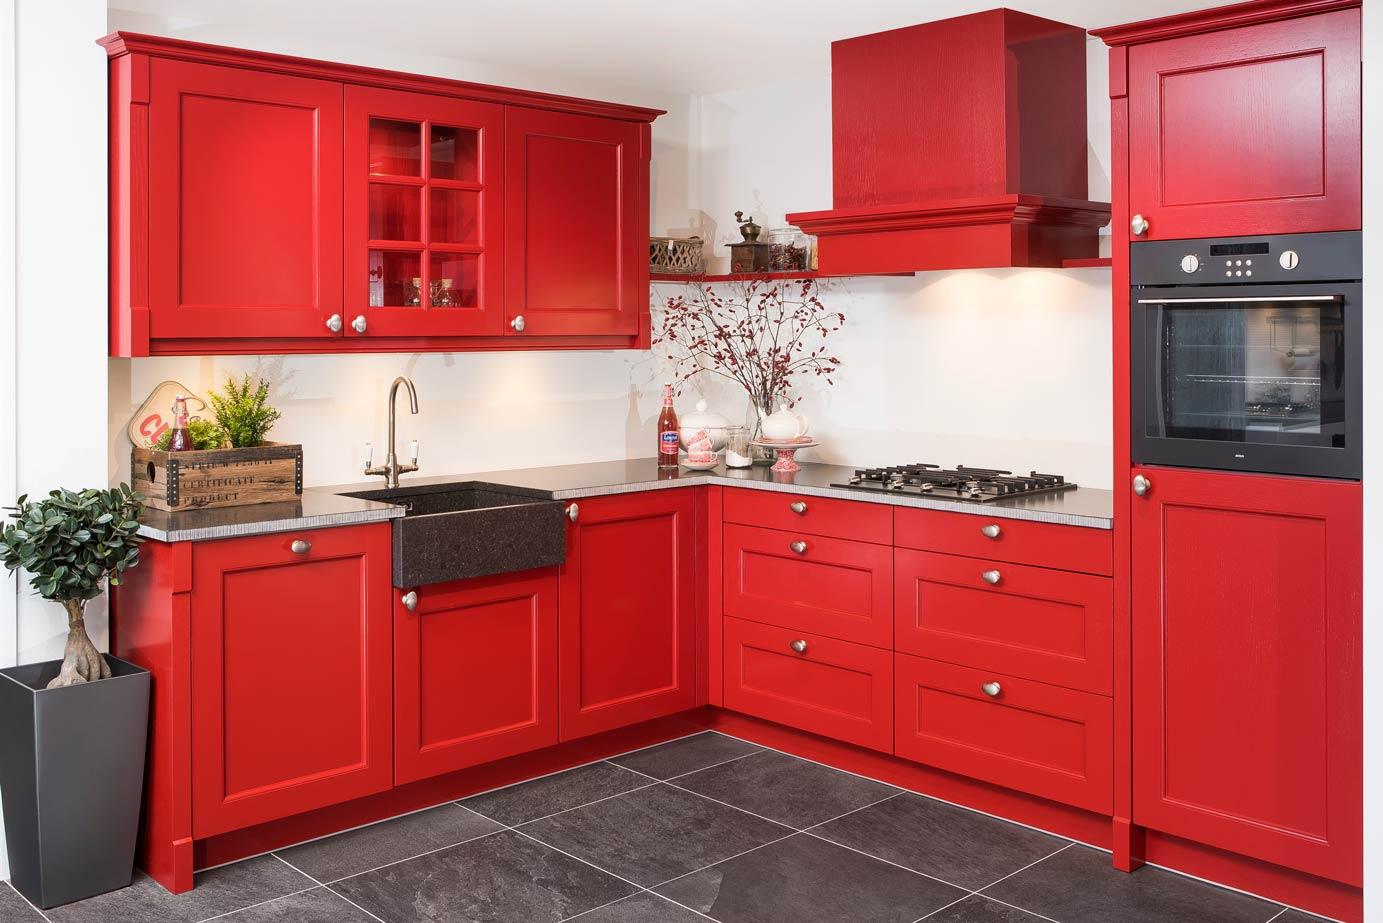 Keukenmerken DBasic line tot SieMatic Lage prijs! DB